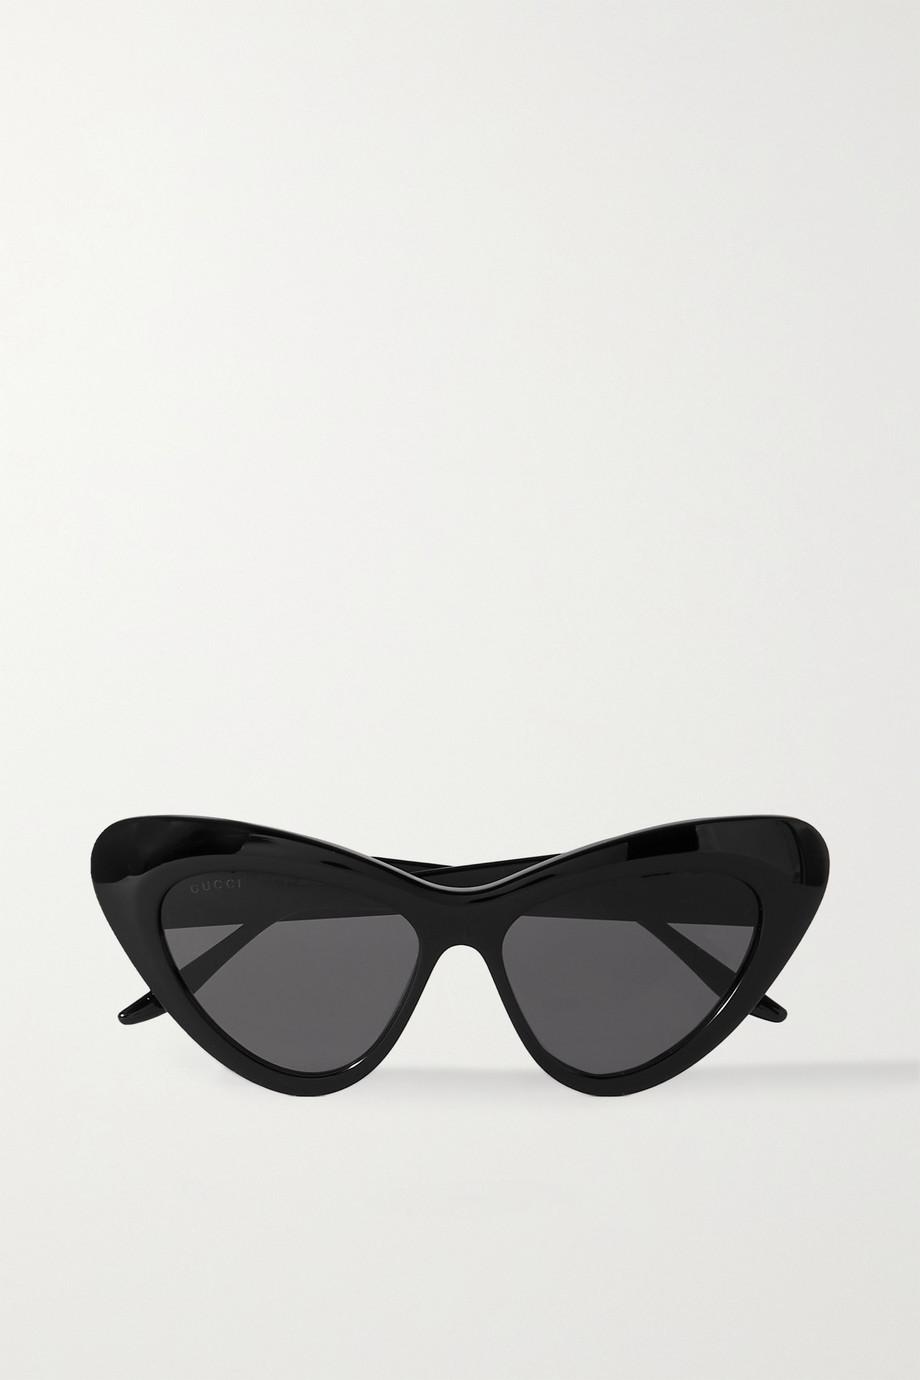 Gucci Sonnenbrille mit Cat-Eye-Rahmen aus Azetat